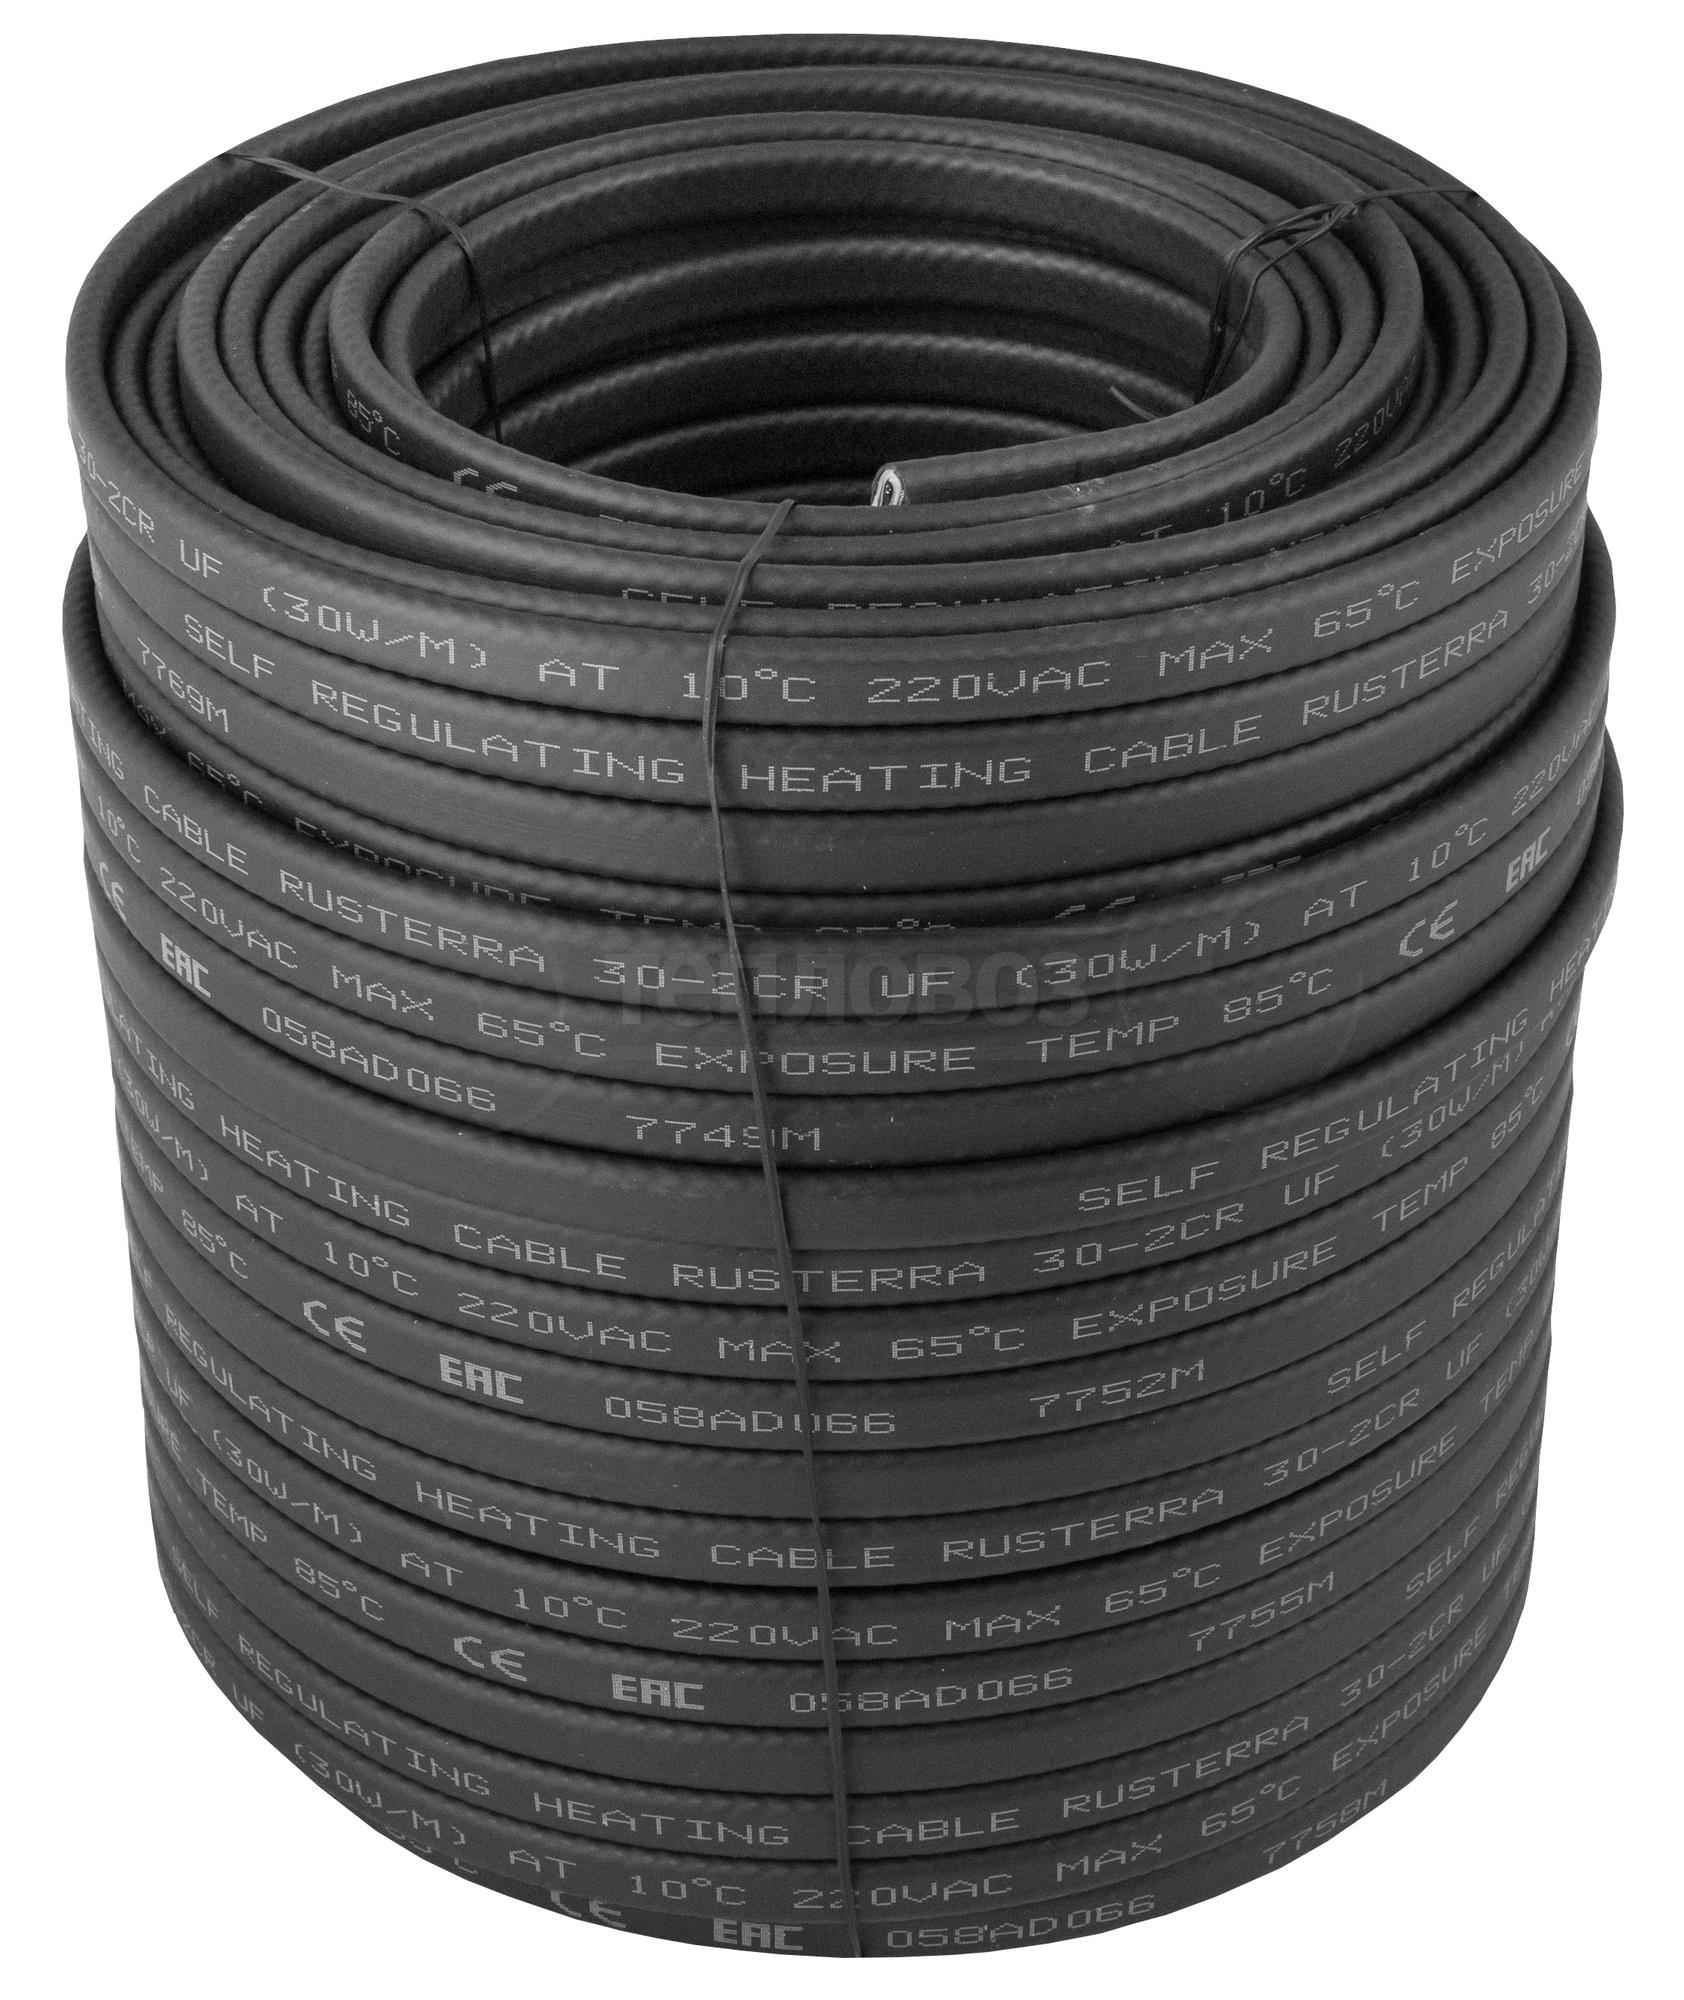 Rusterra 30-2CR UF кабель саморегулирующийся (1м)